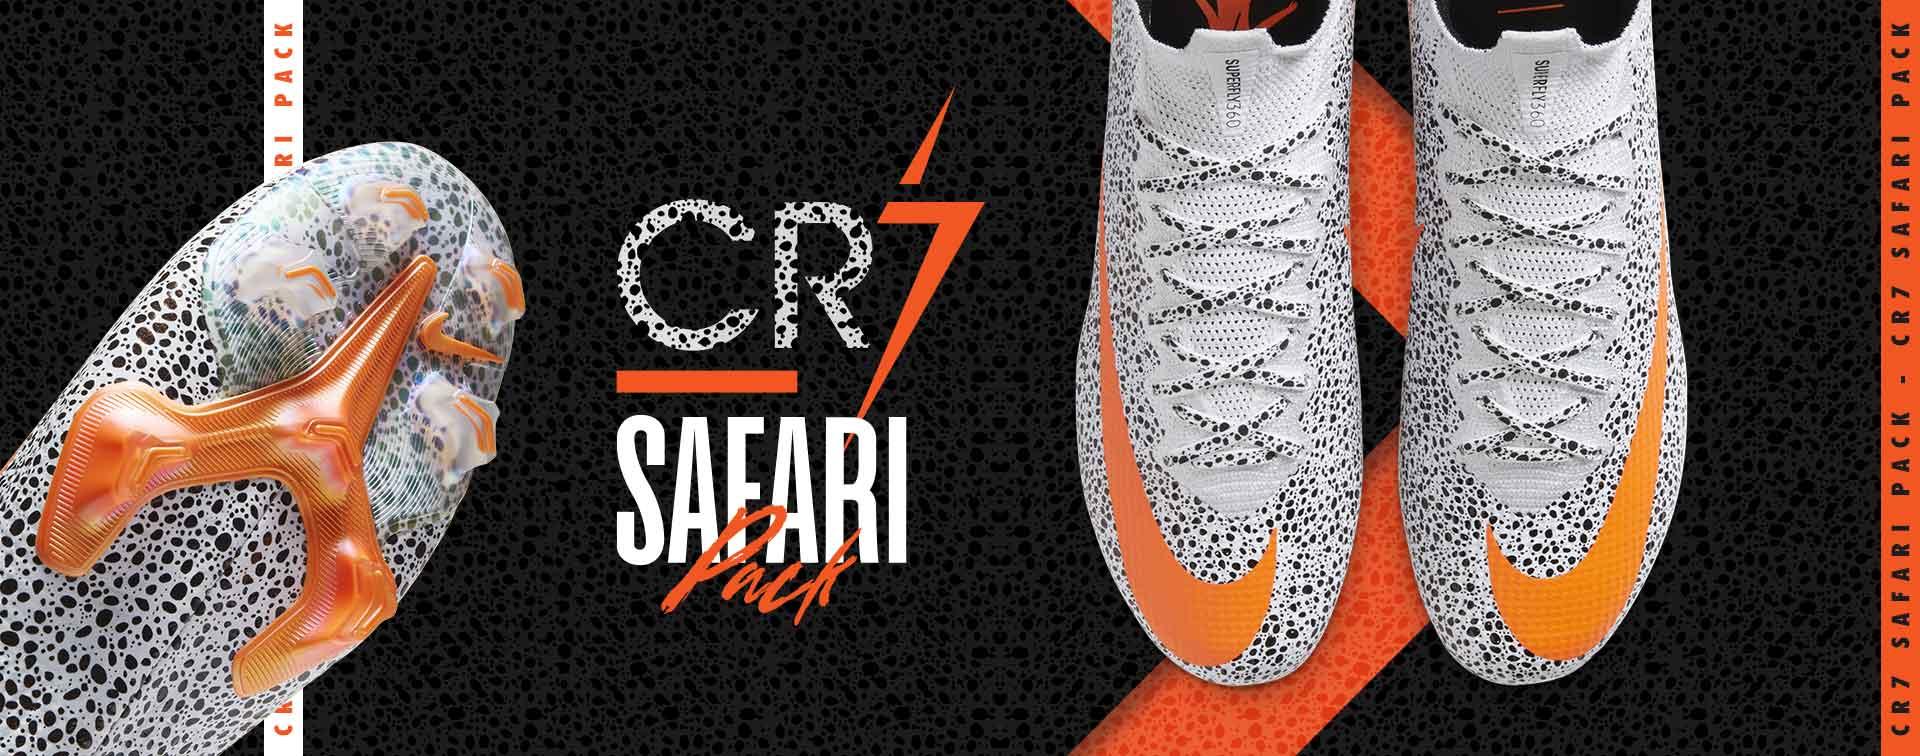 nouveaux crampons Nike CR7 Safari